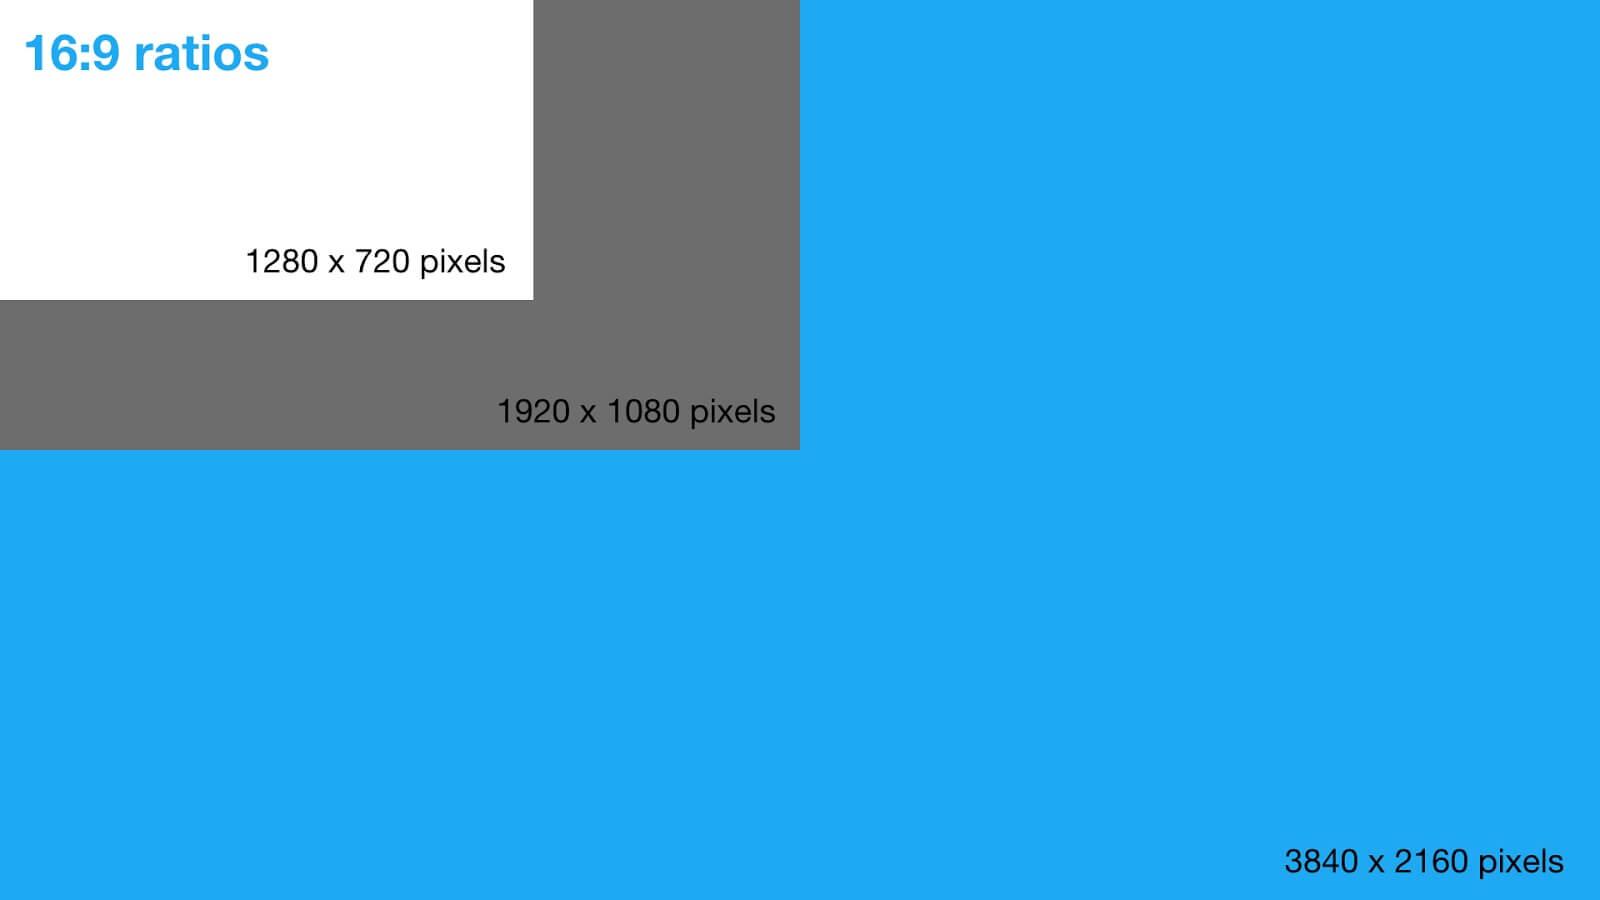 ration vs pixel